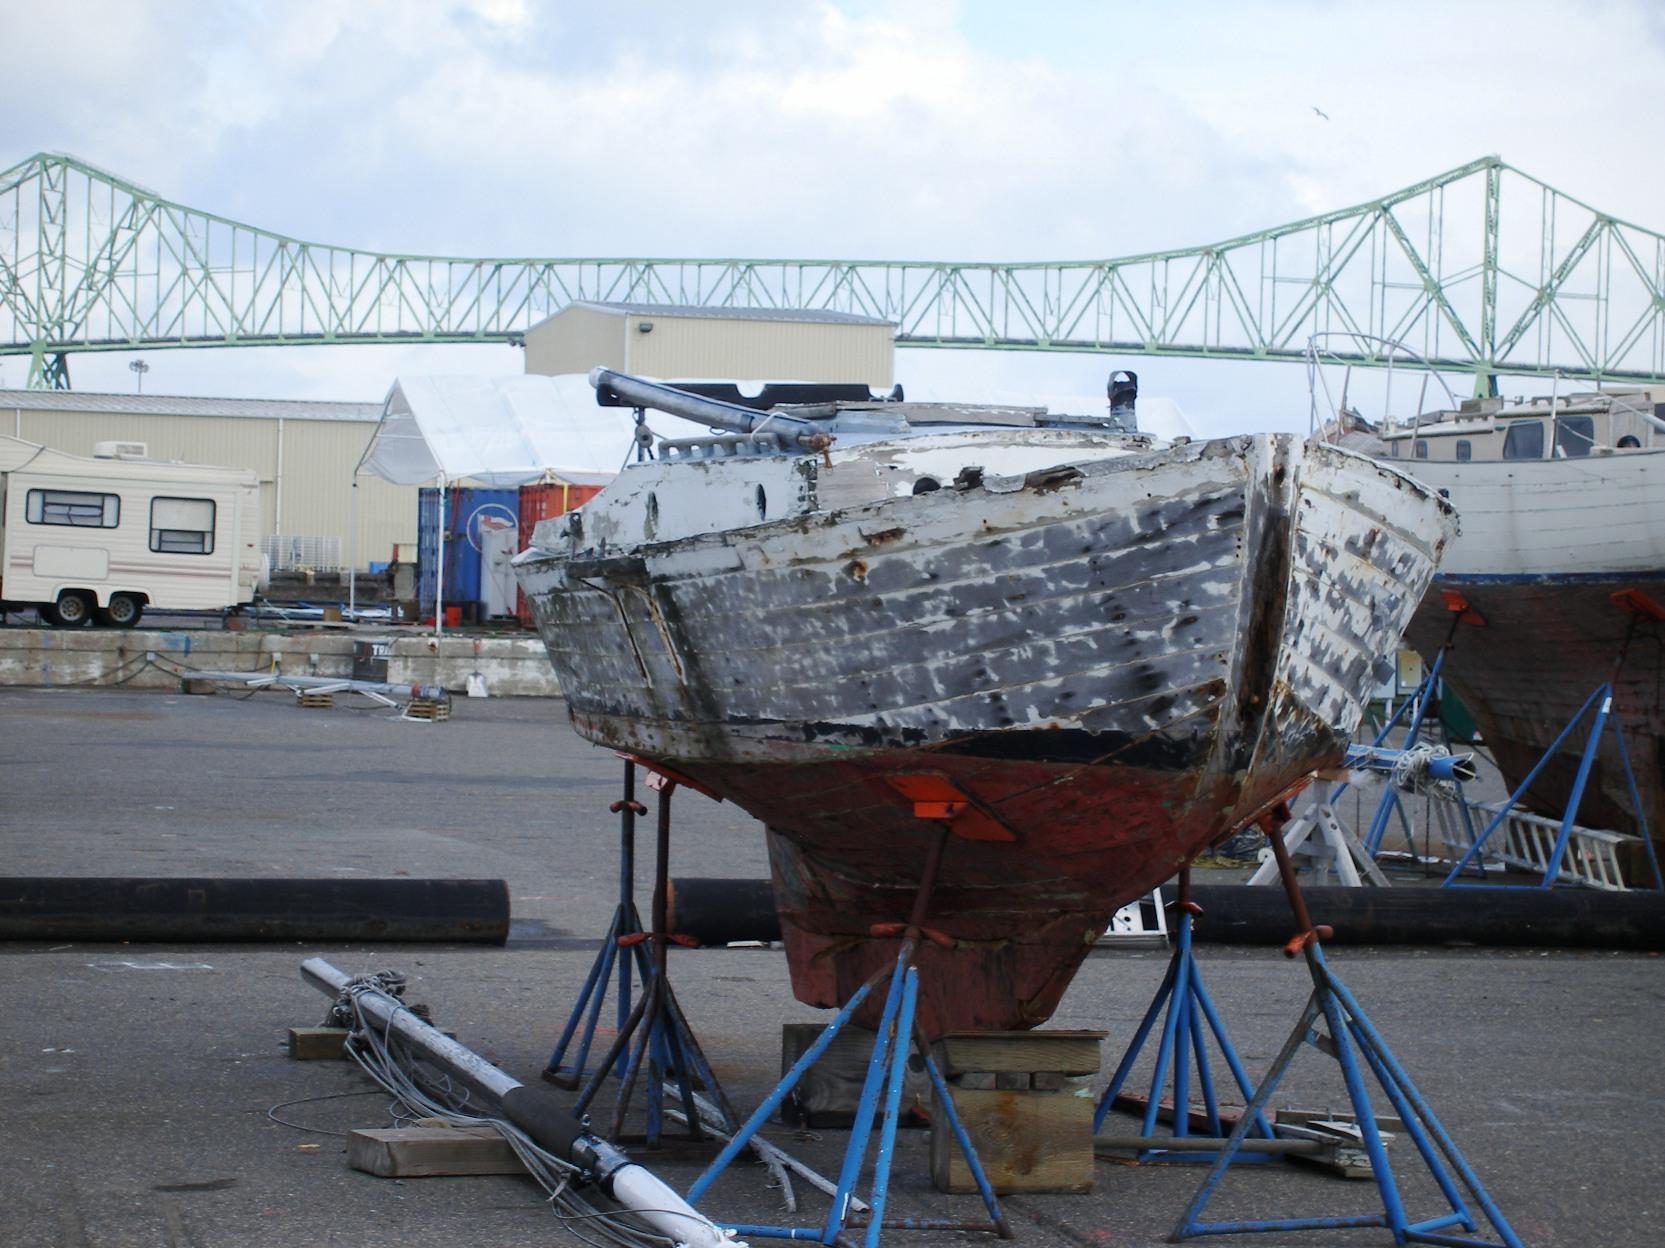 A sailboat hull sits up on blocks, the Astoria-Megler bridge is backdrop